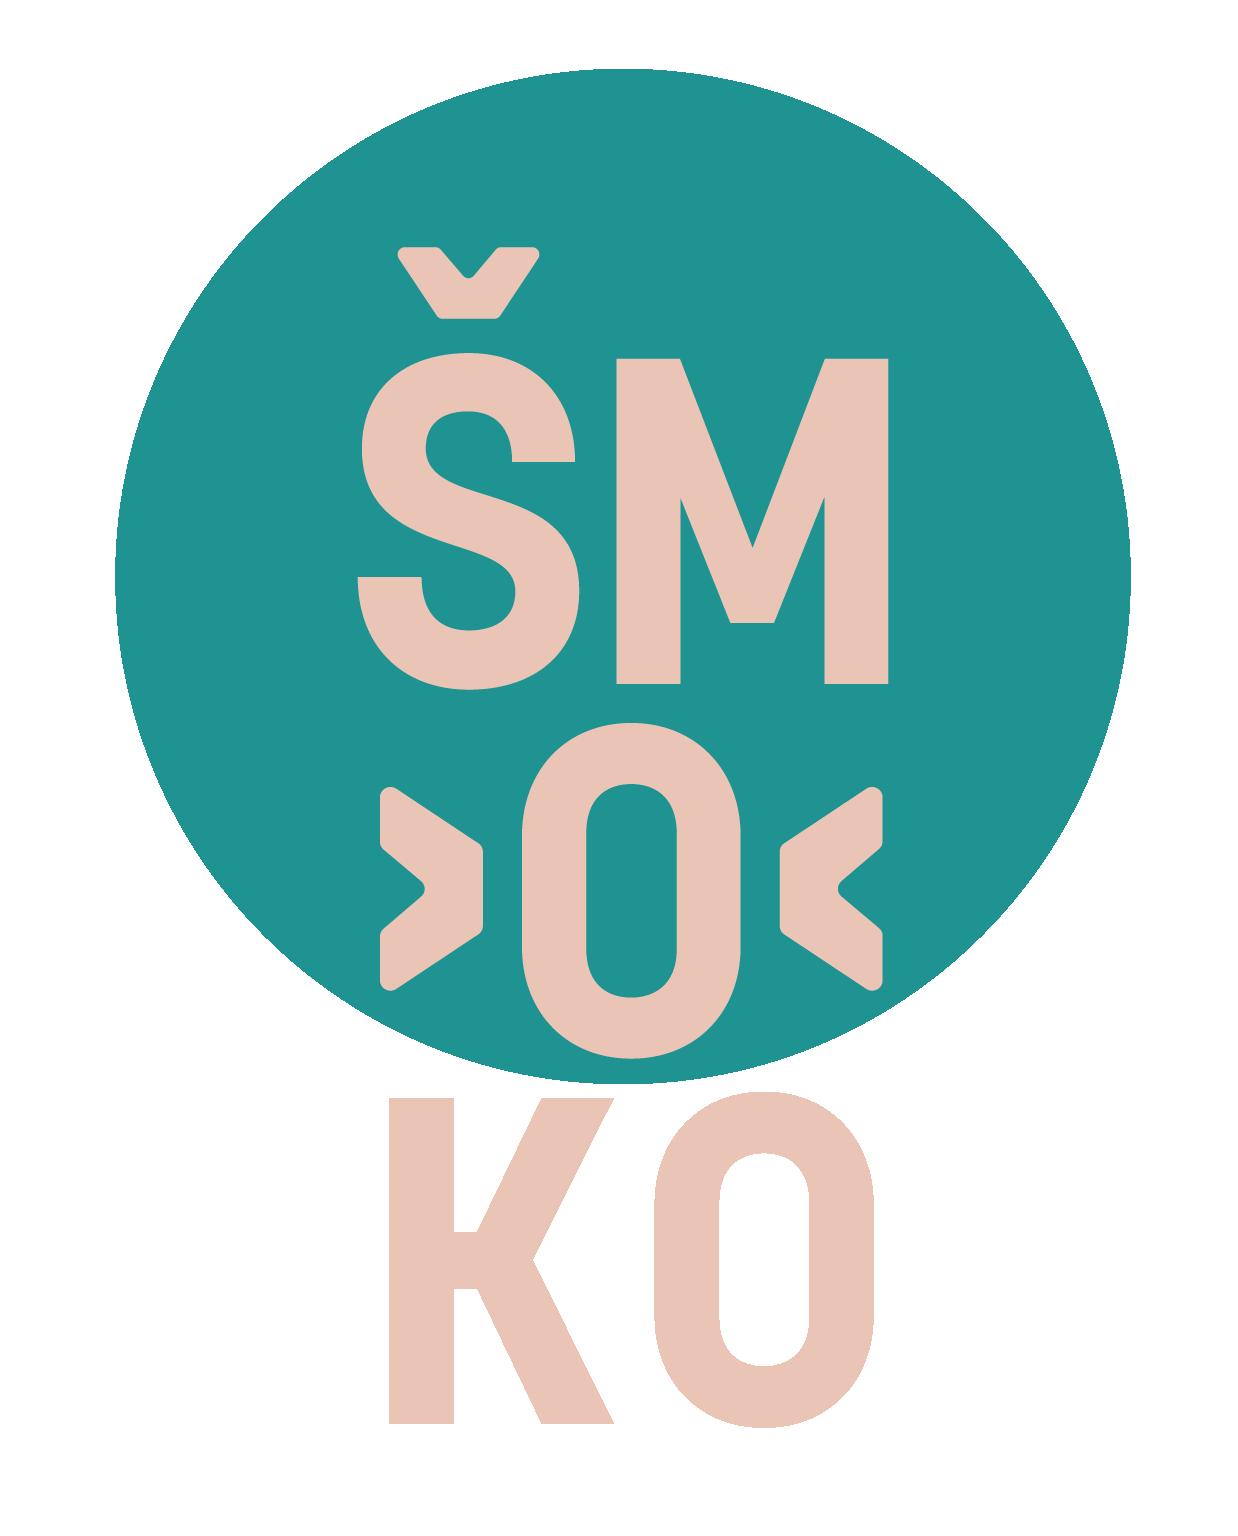 šmöko logo